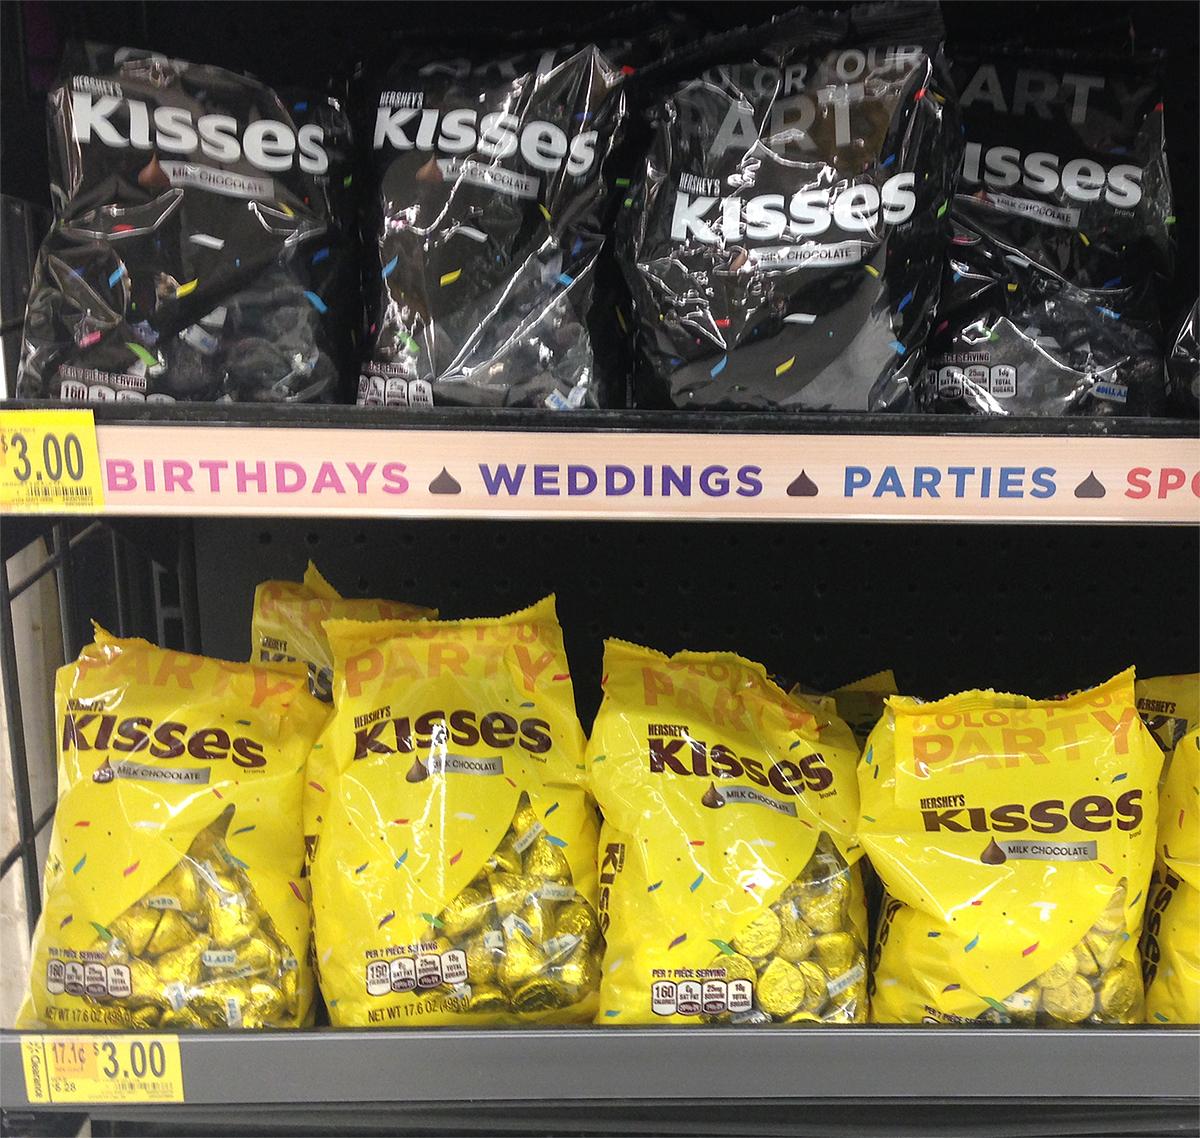 kisses party bag price